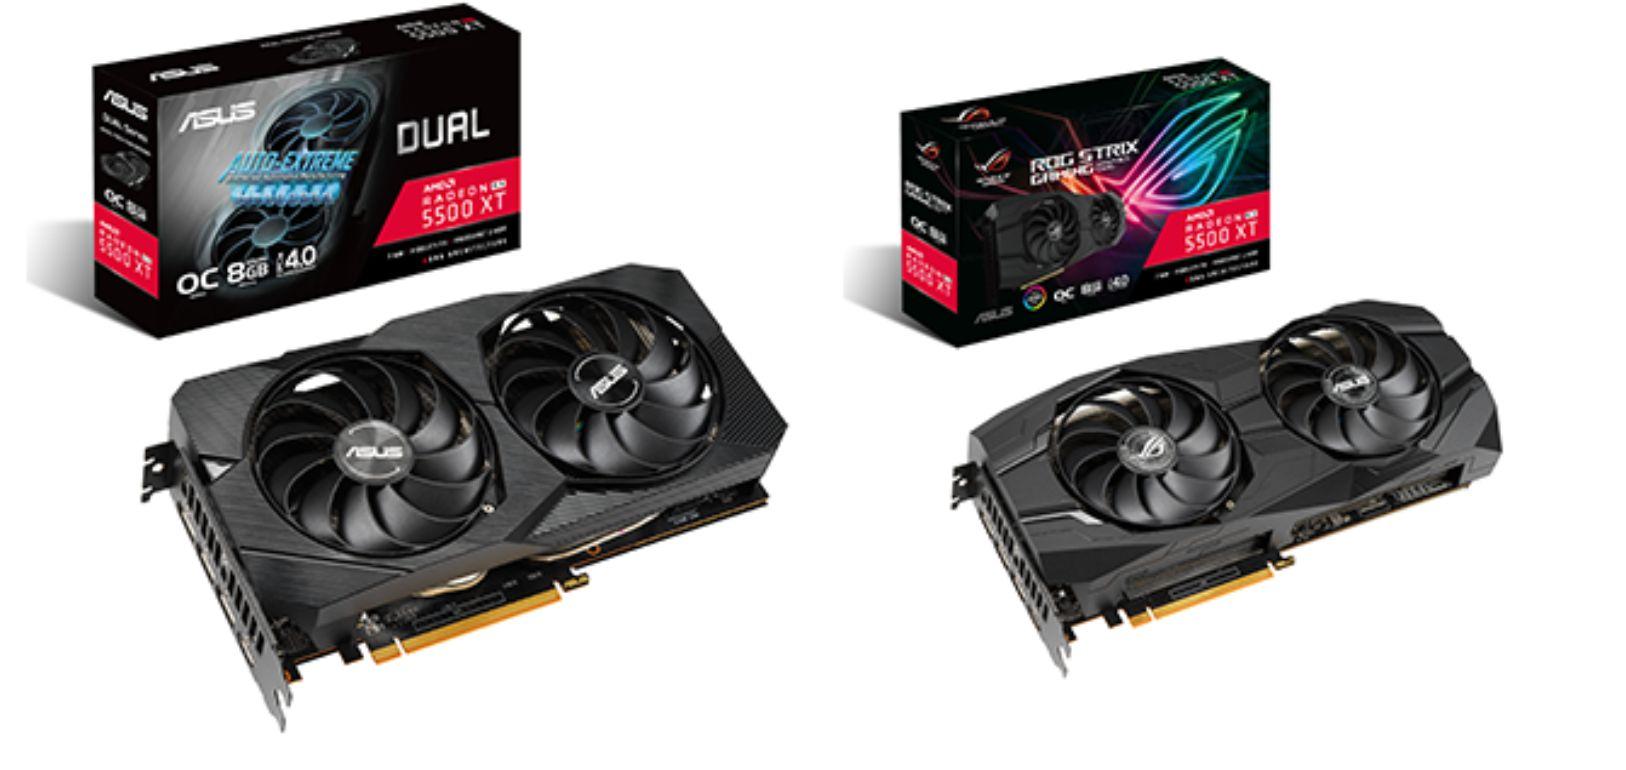 ASUS: ecco le schede video ROG Strix e Dual Radeon RX 5500 XT thumbnail